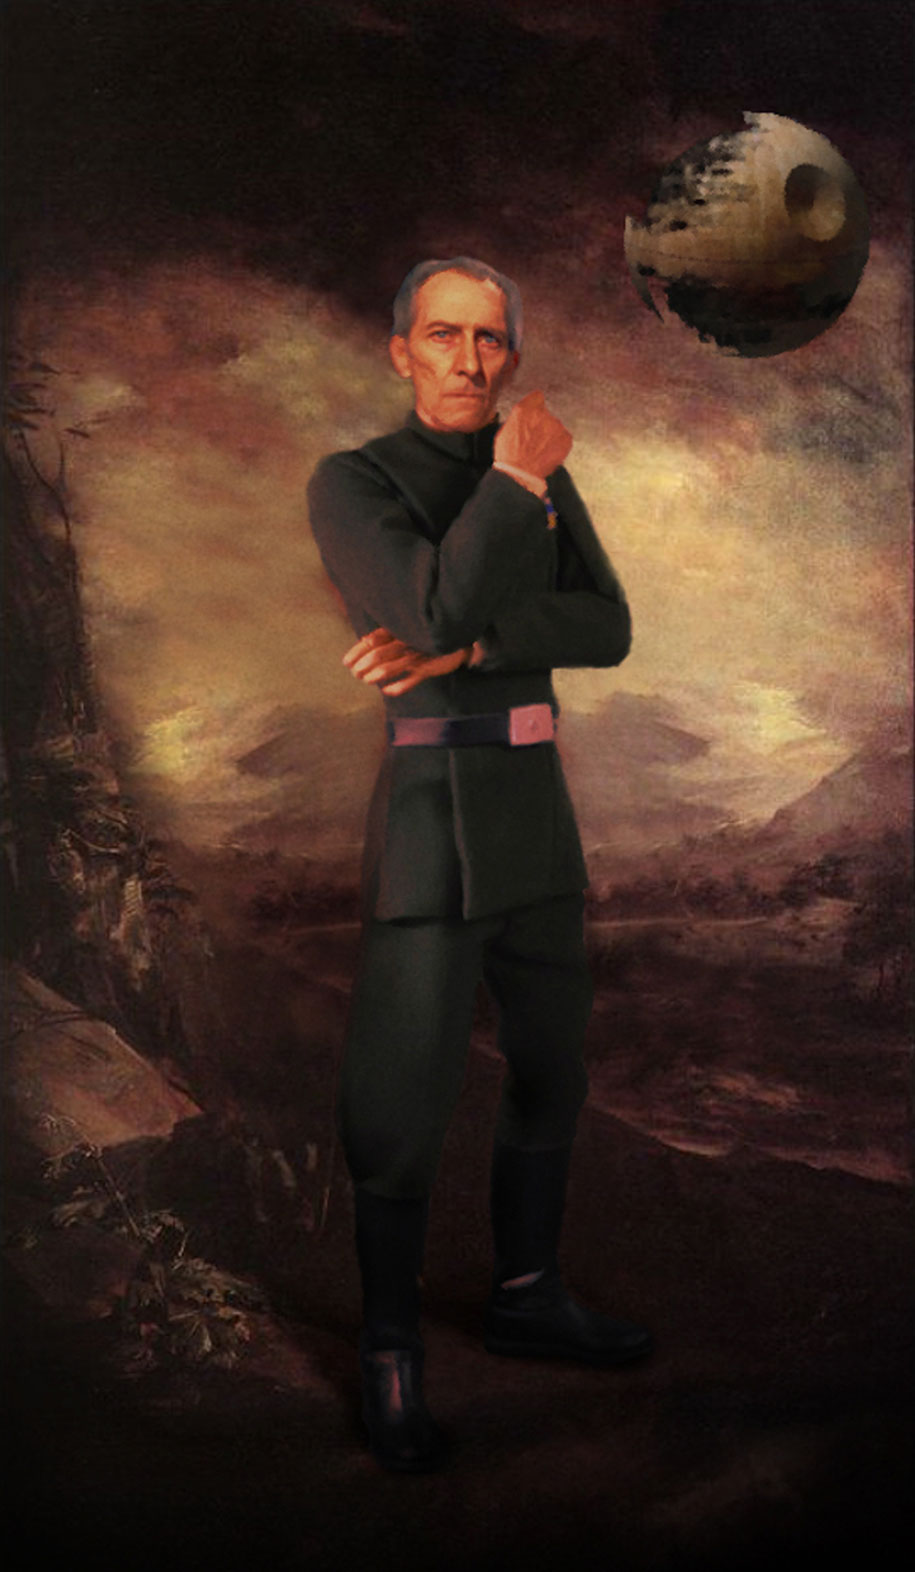 classical-paintings-art-history-star-wars-david-hamilton-9